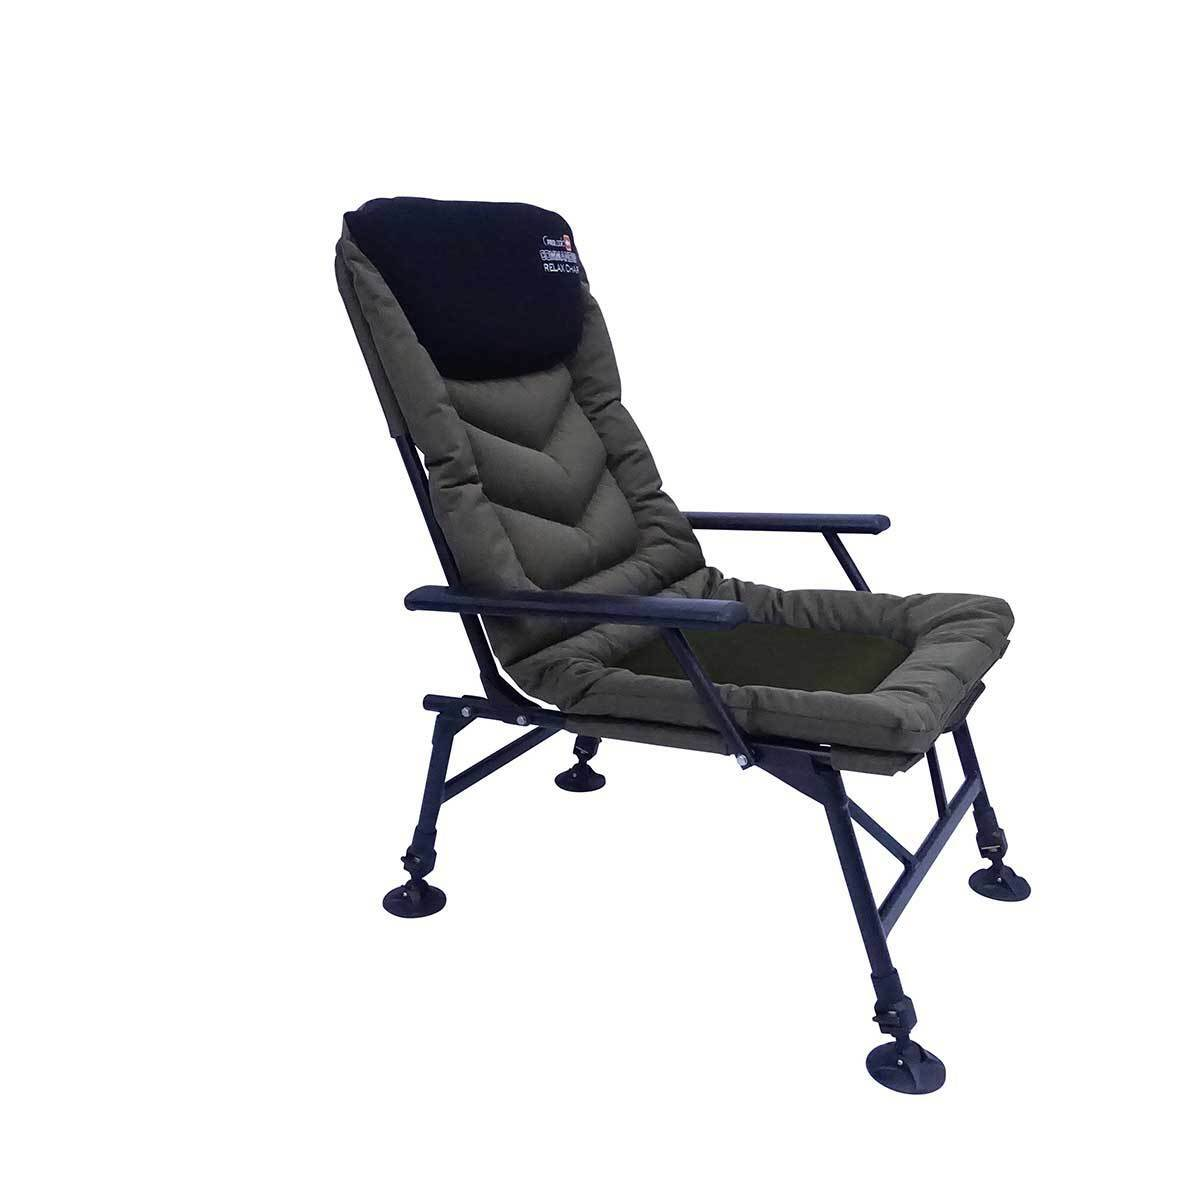 Prologic Commander Travel Green Padded Carp Fishing Chair Armchair 54335